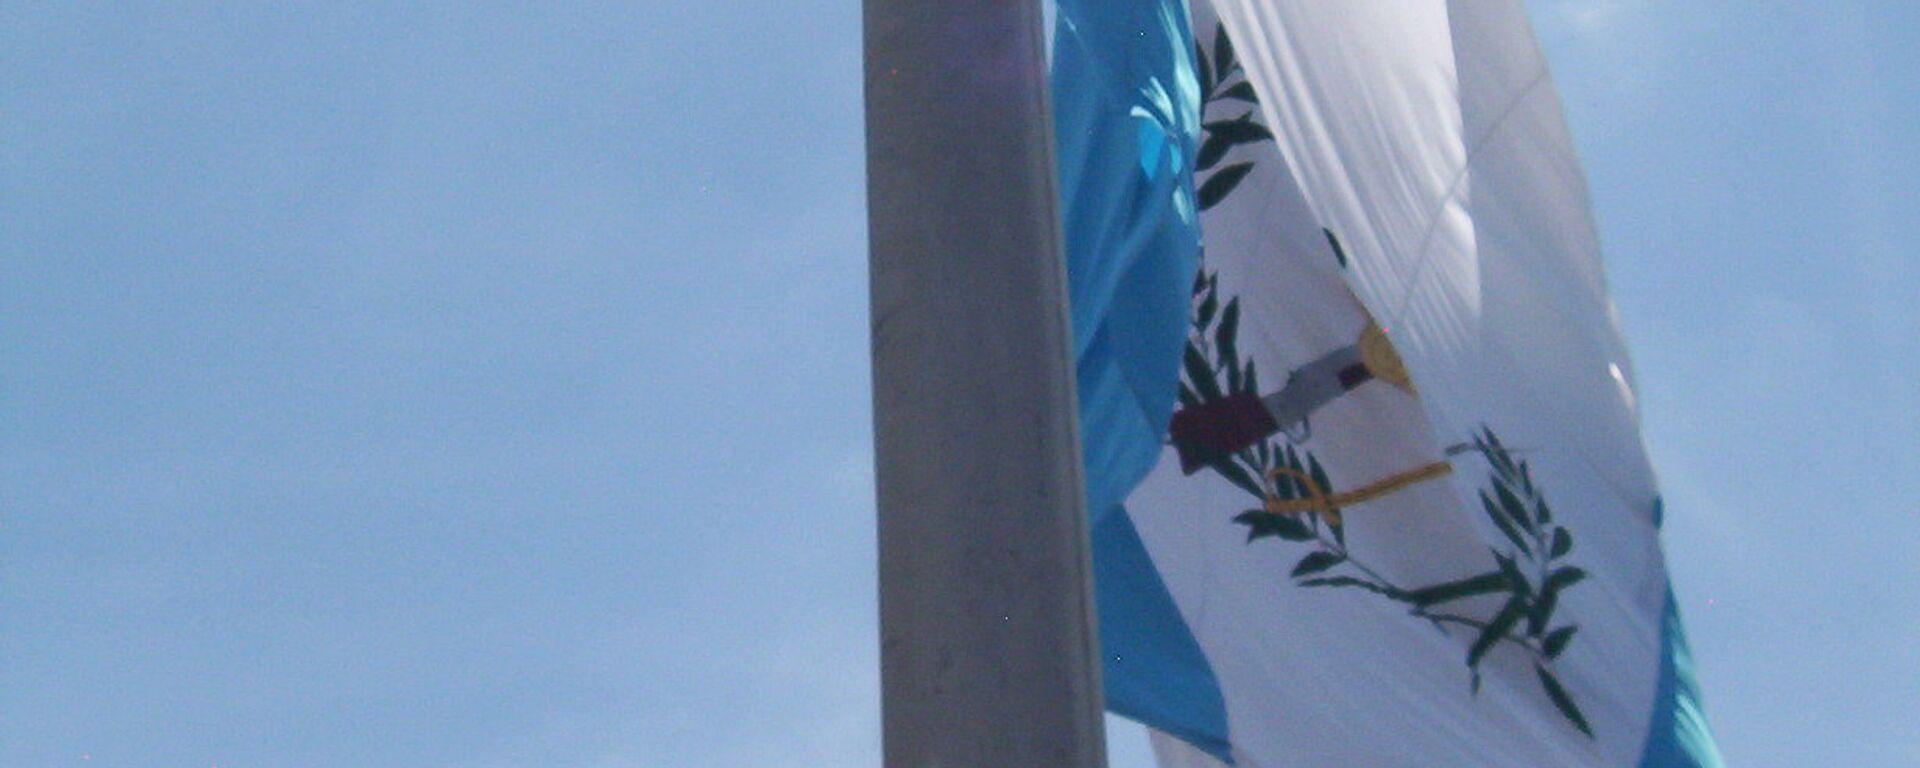 Bandera de Guatemala - Sputnik Mundo, 1920, 17.06.2021